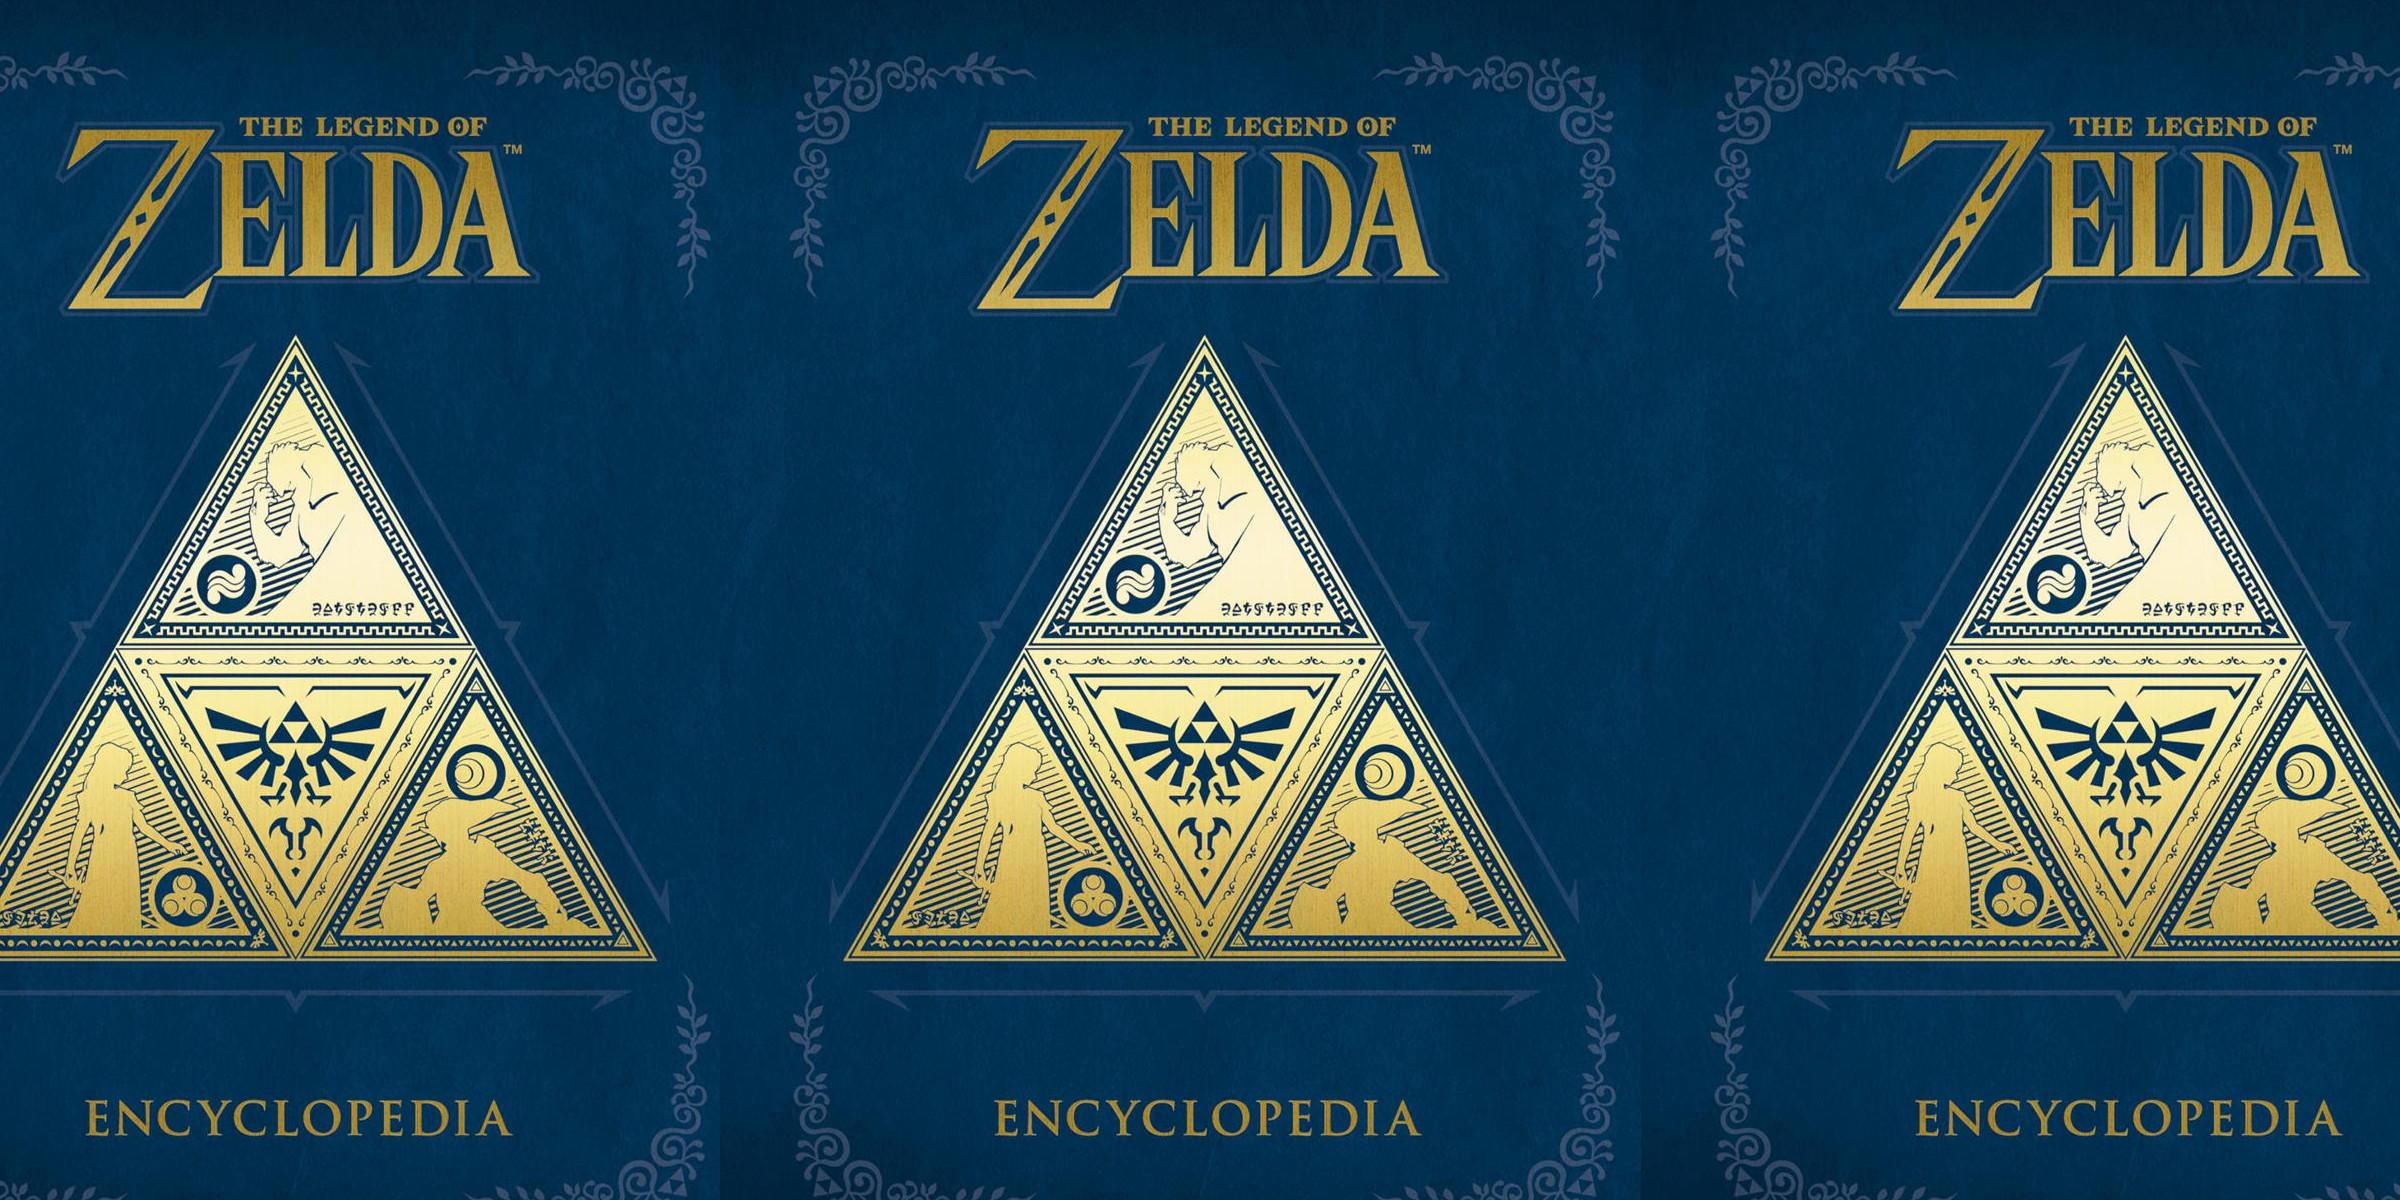 Legend of Zelda Encyclopedia Hardcover Book 40% off: pre-order for $24 Prime shipped